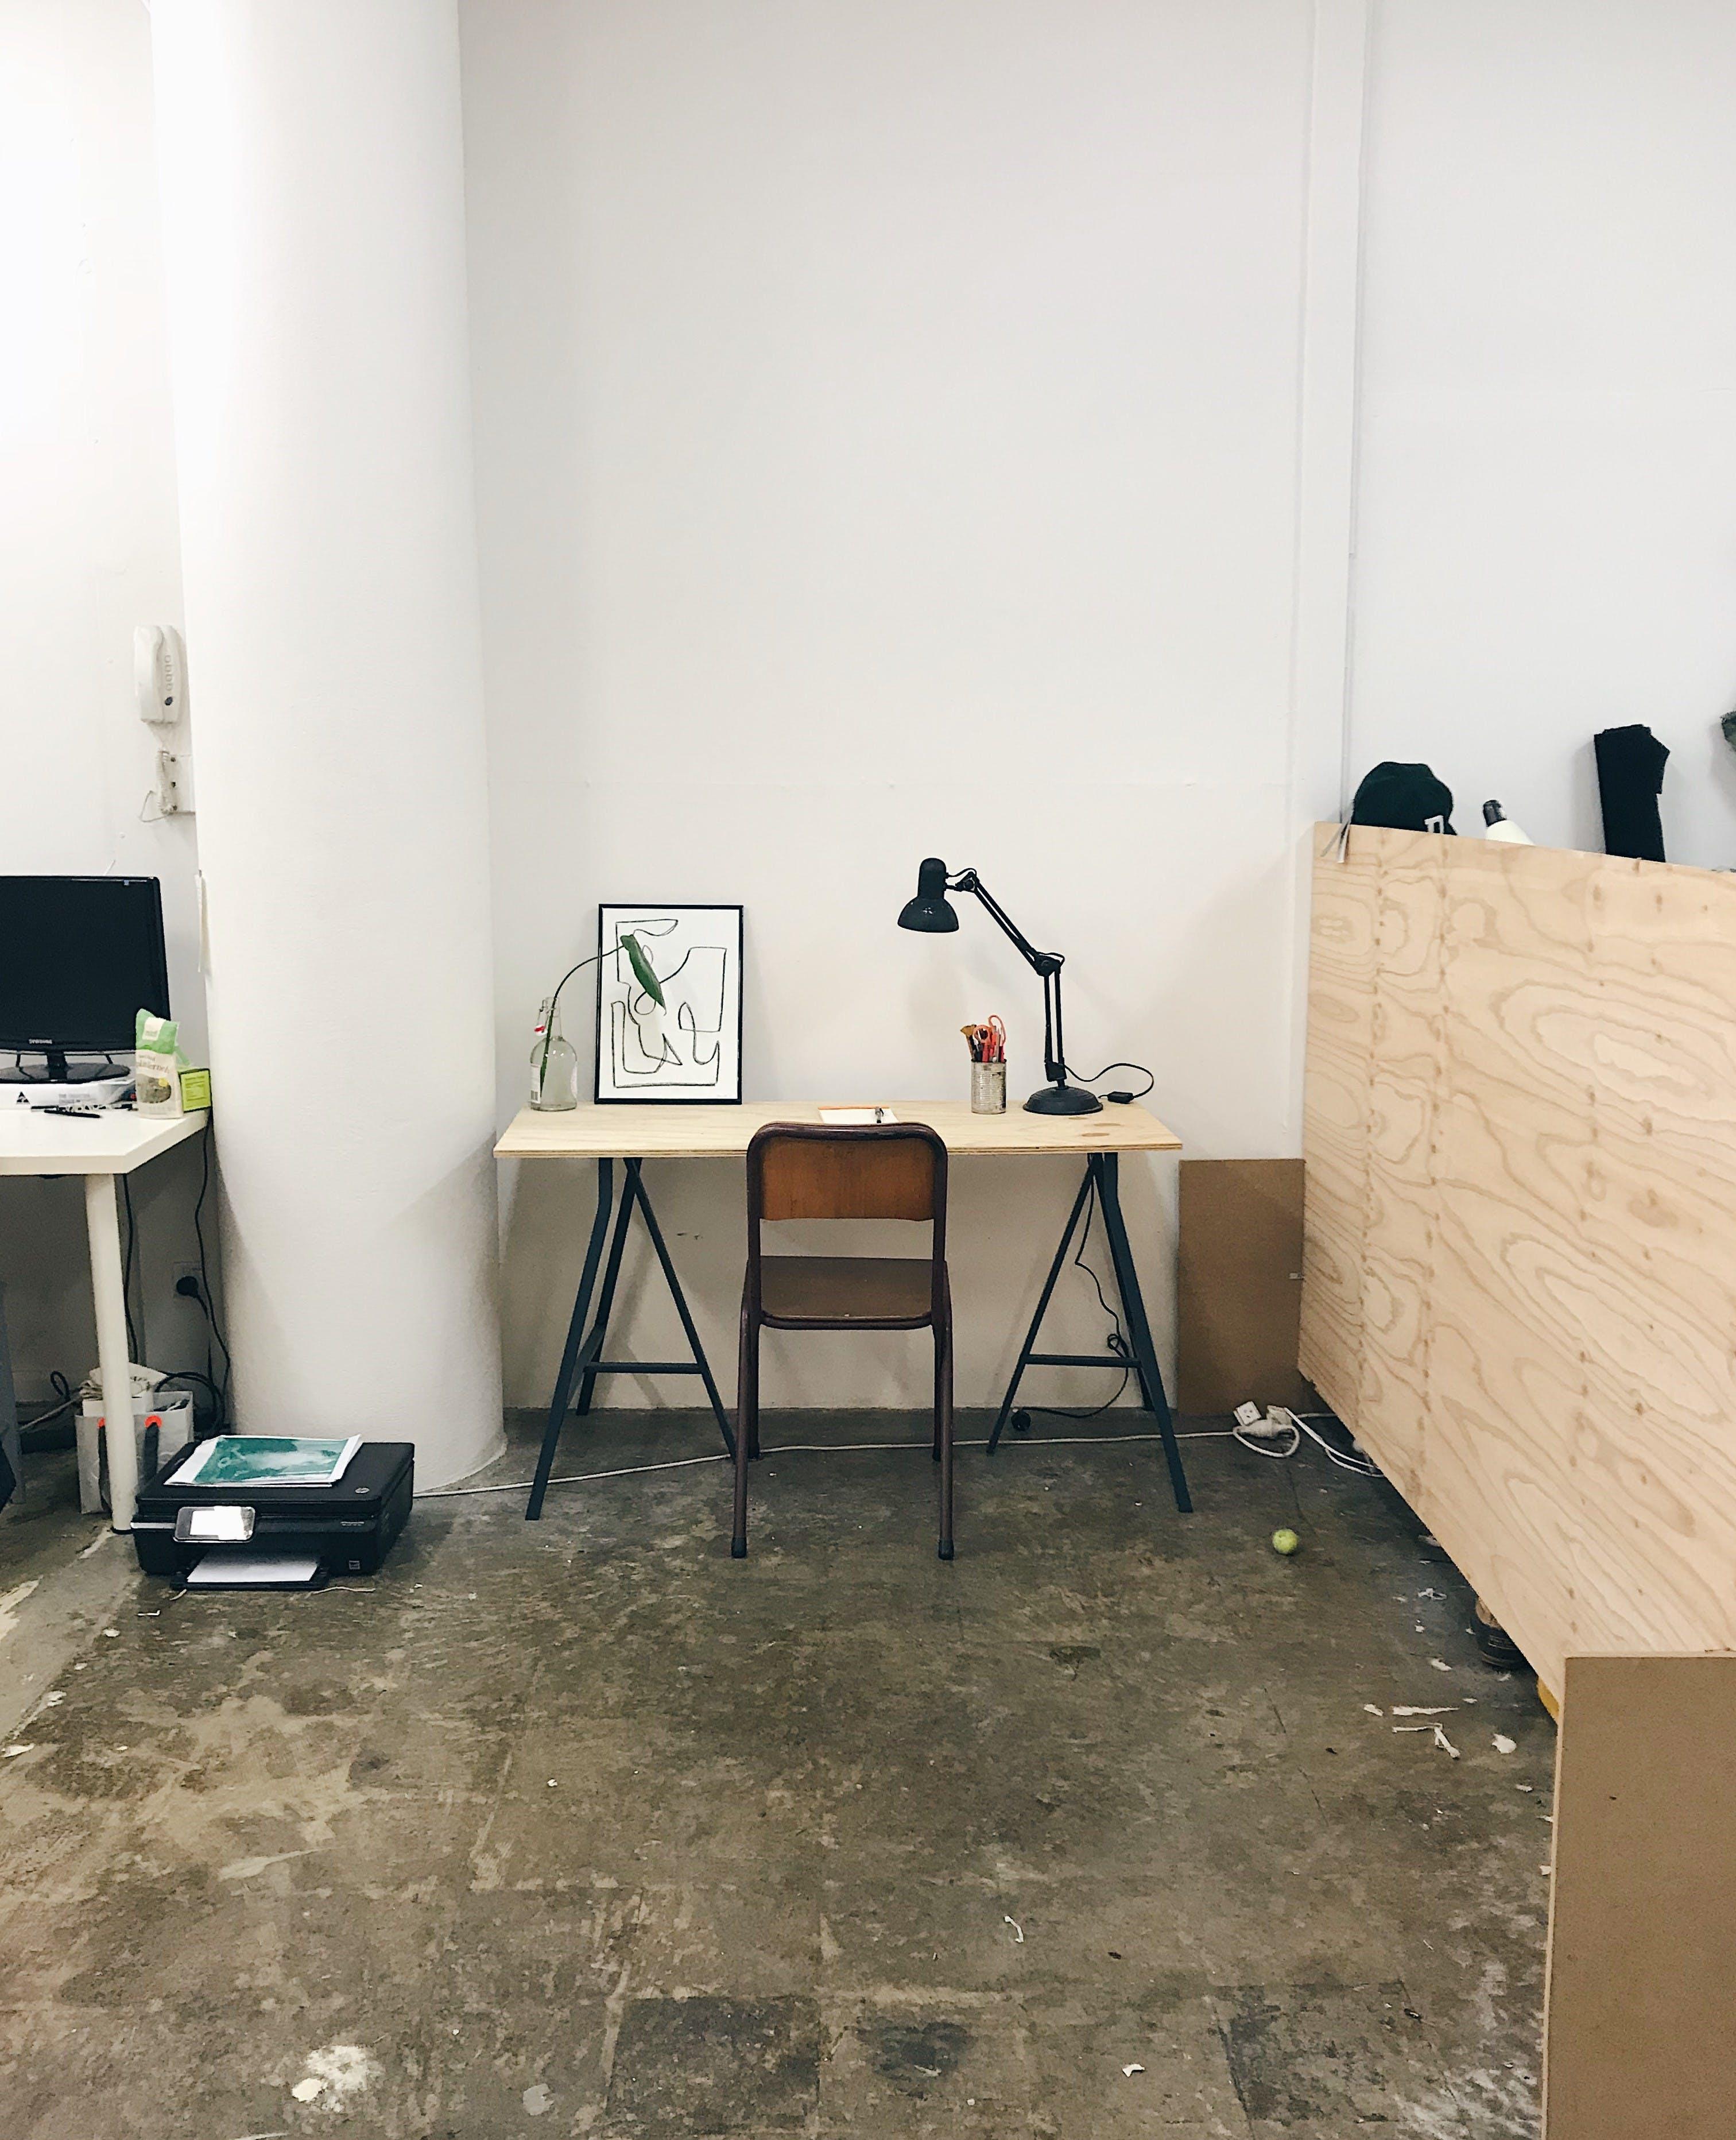 Workshop at Provider Store, image 6